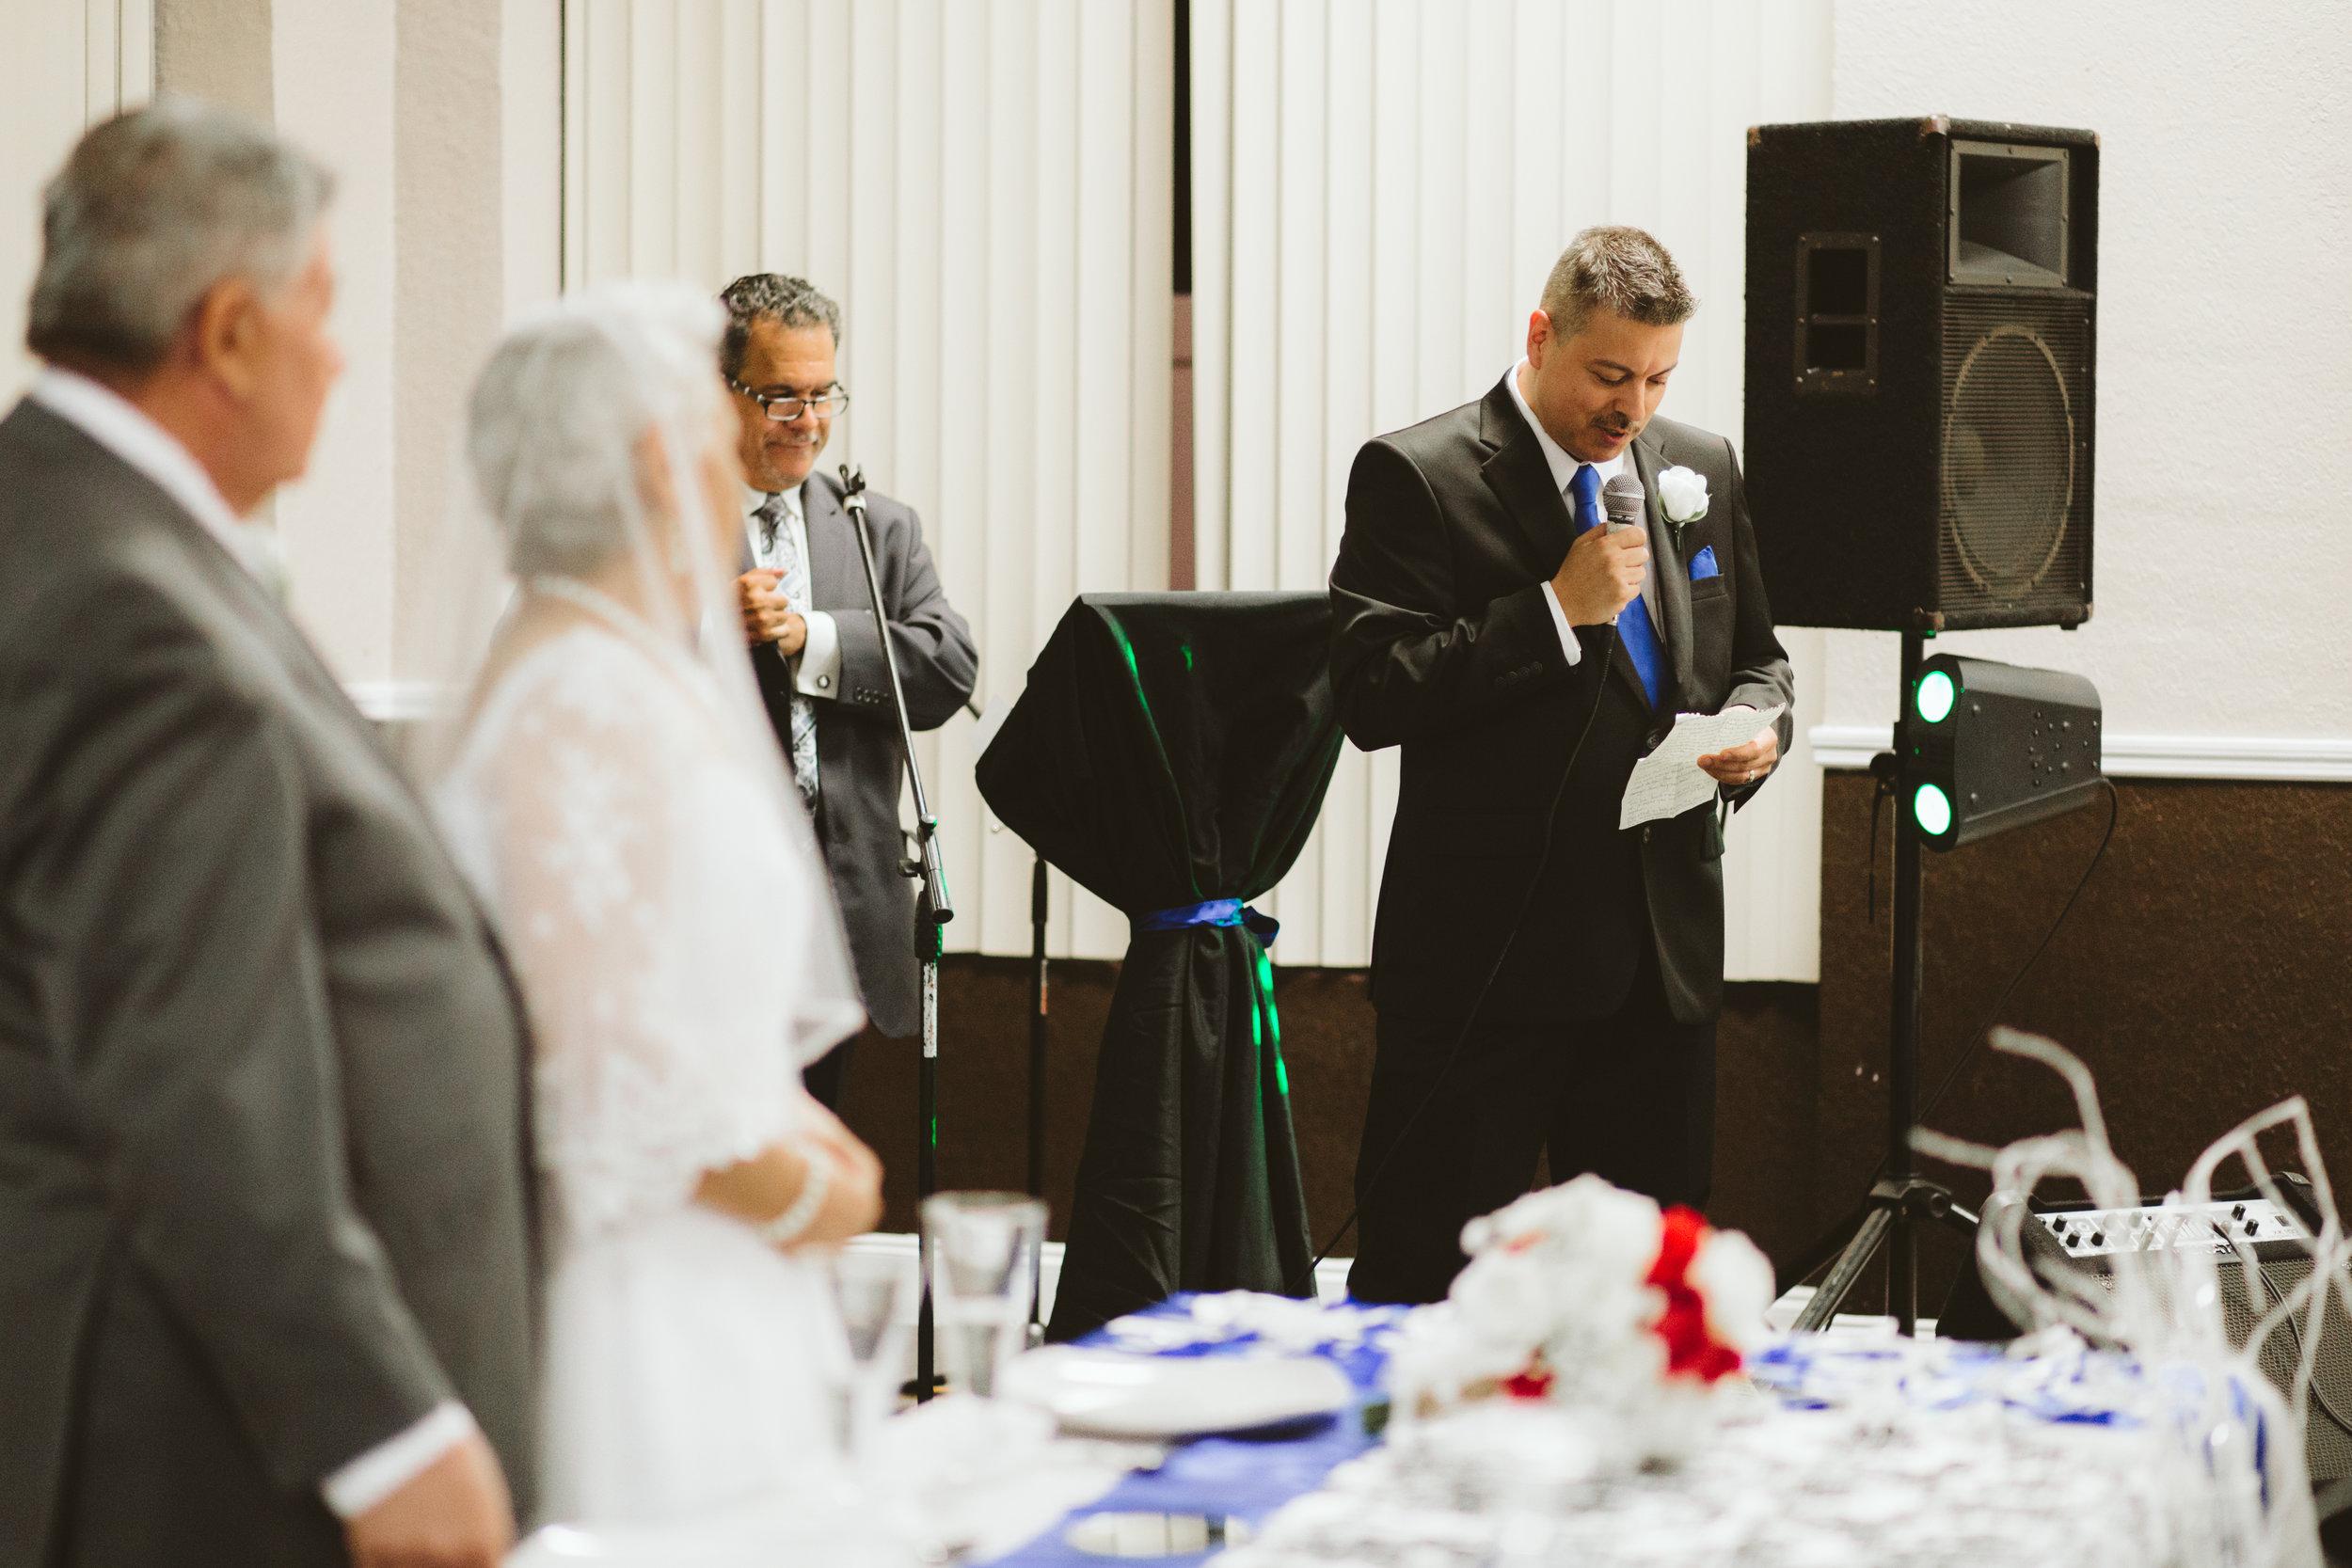 wedding | Vanessa Boy Photography | vanessaboy.com |-269.jpg